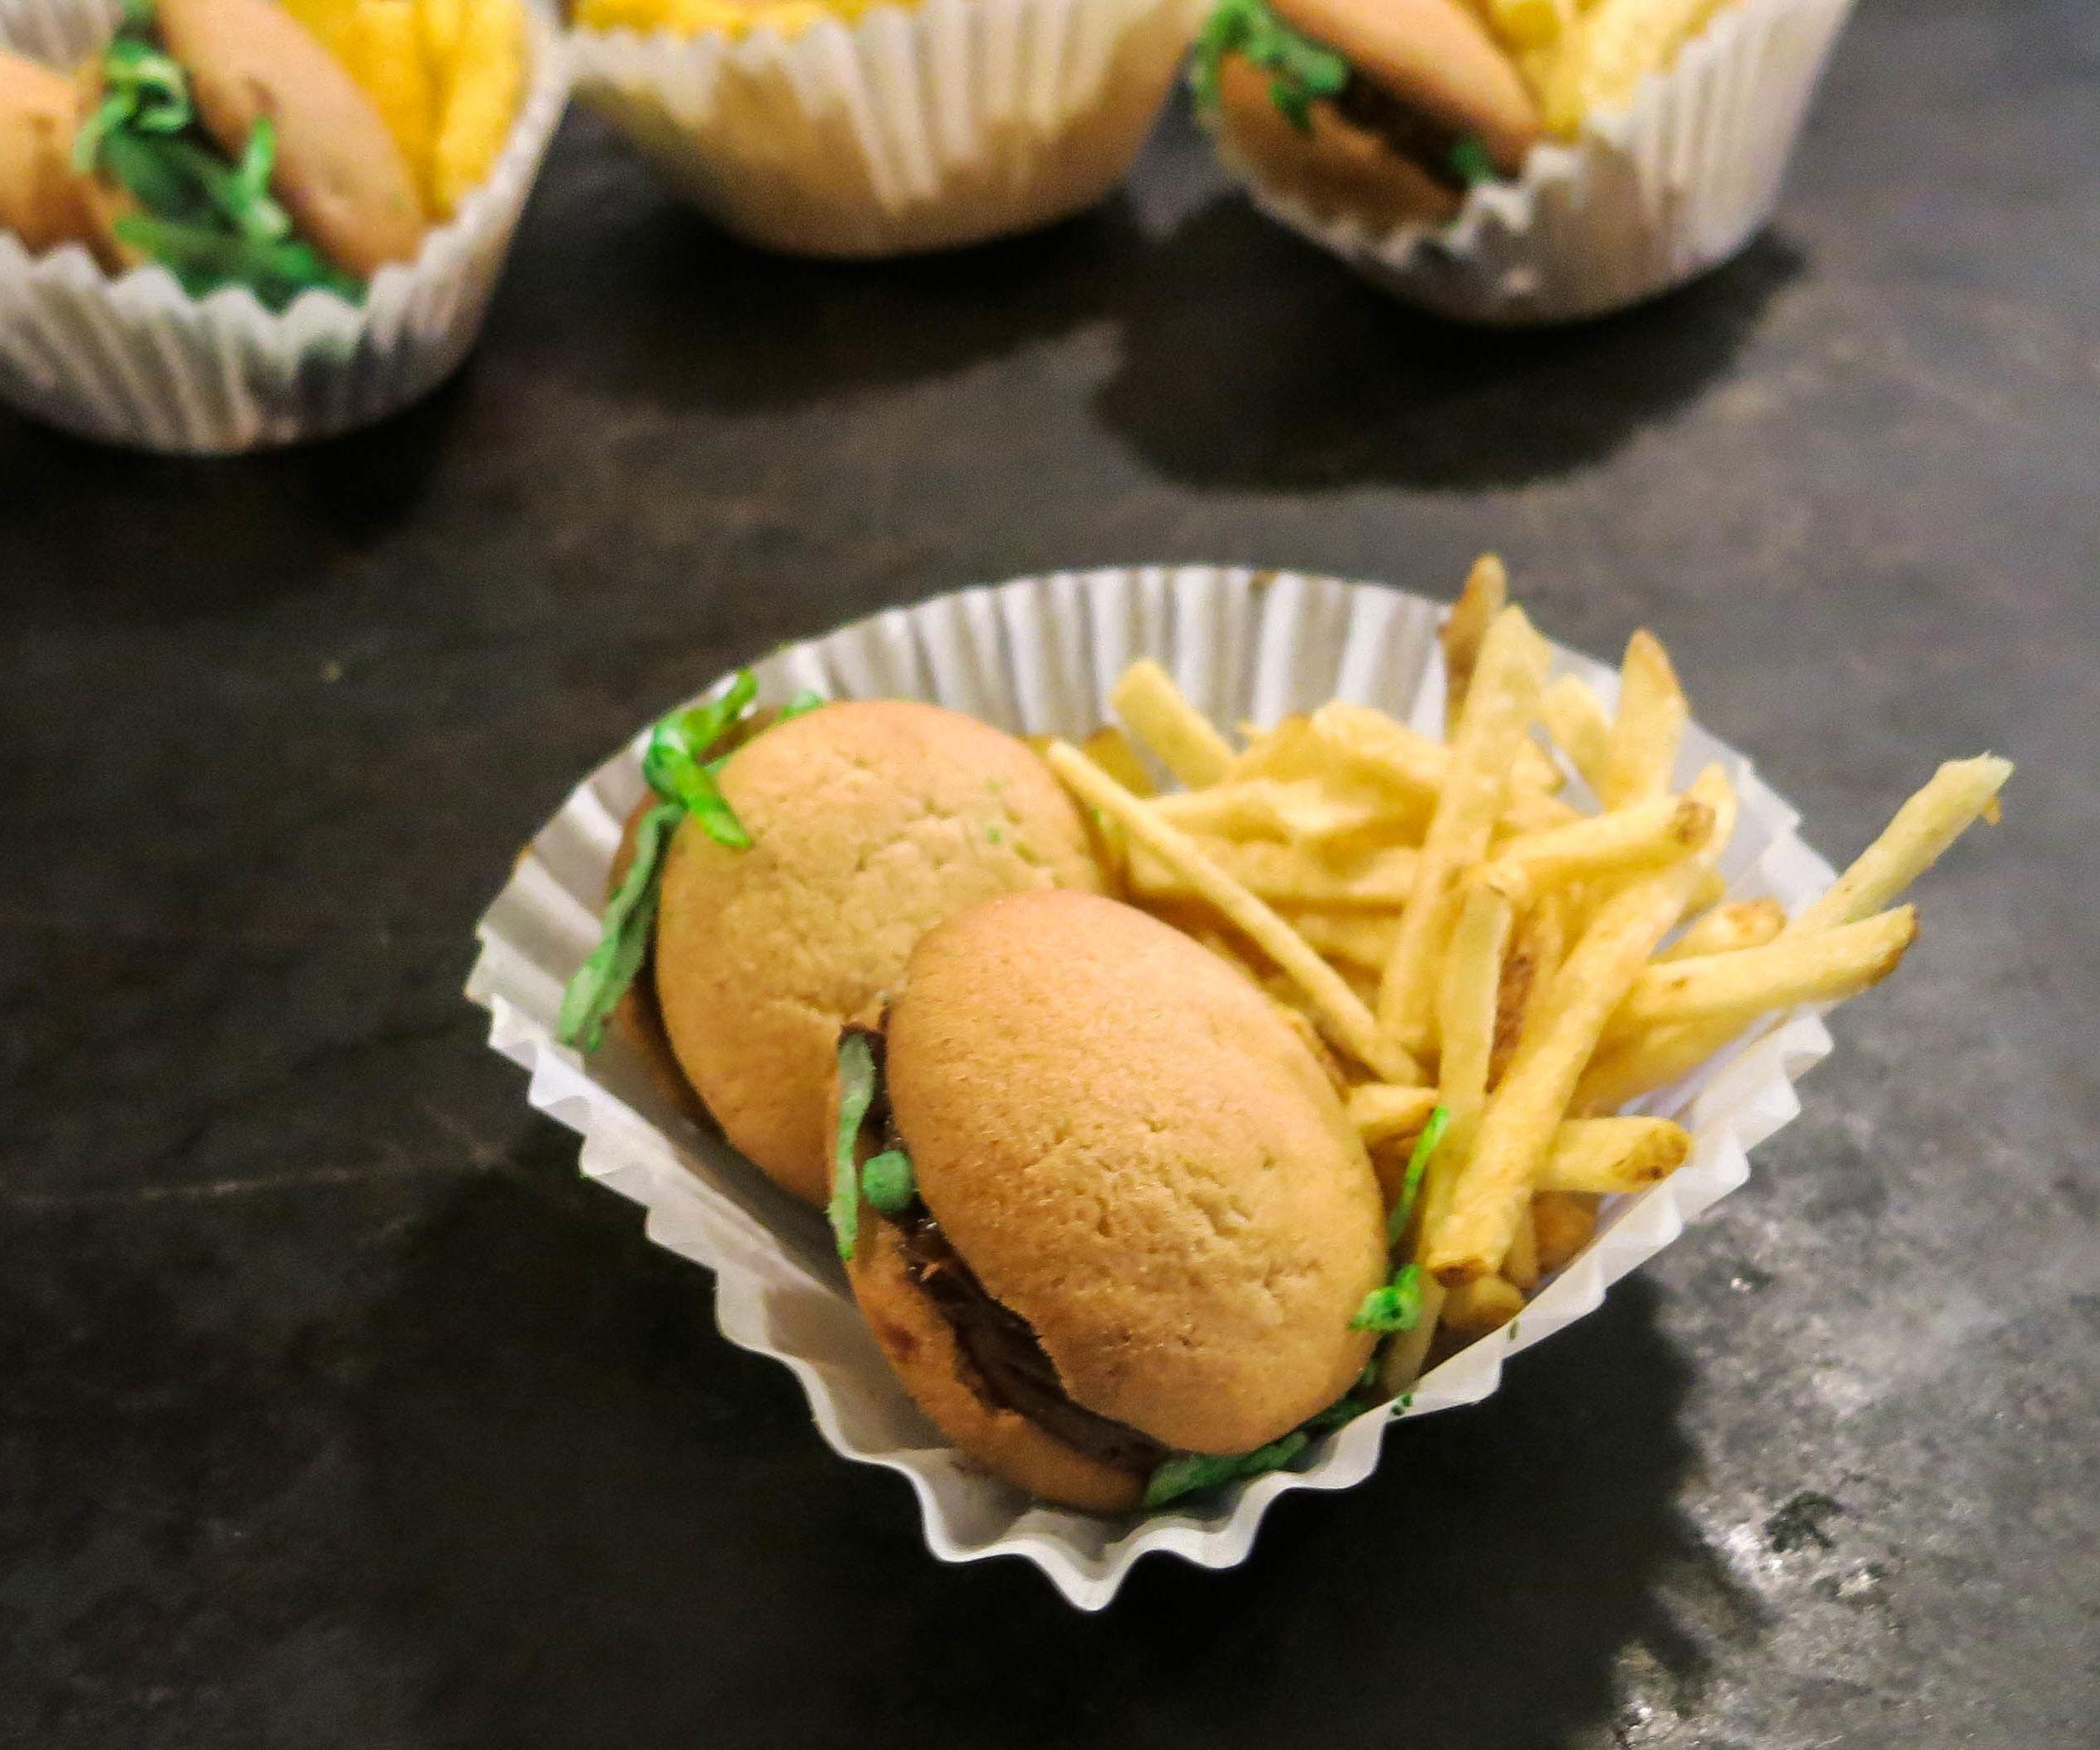 Snacks for Kids' Parties, Picnics, Reunions & More